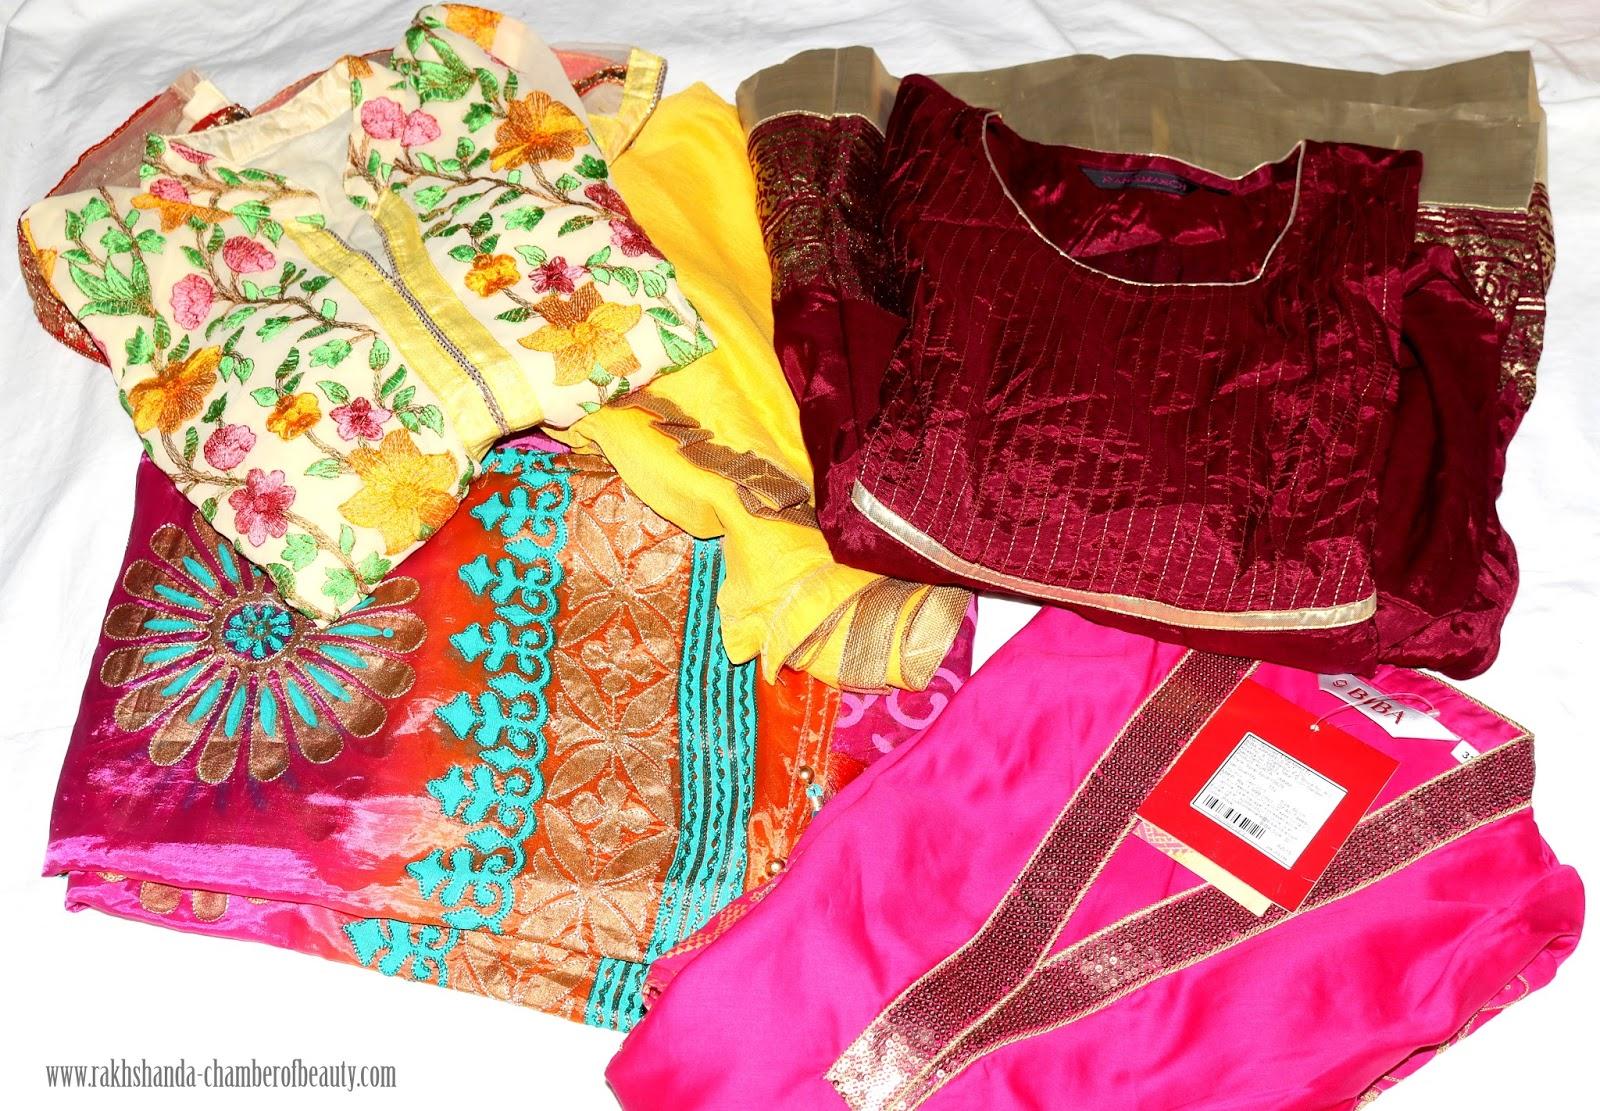 www.rakhshanda-chamberofbeauty.com/online shopping/ Ethnic love